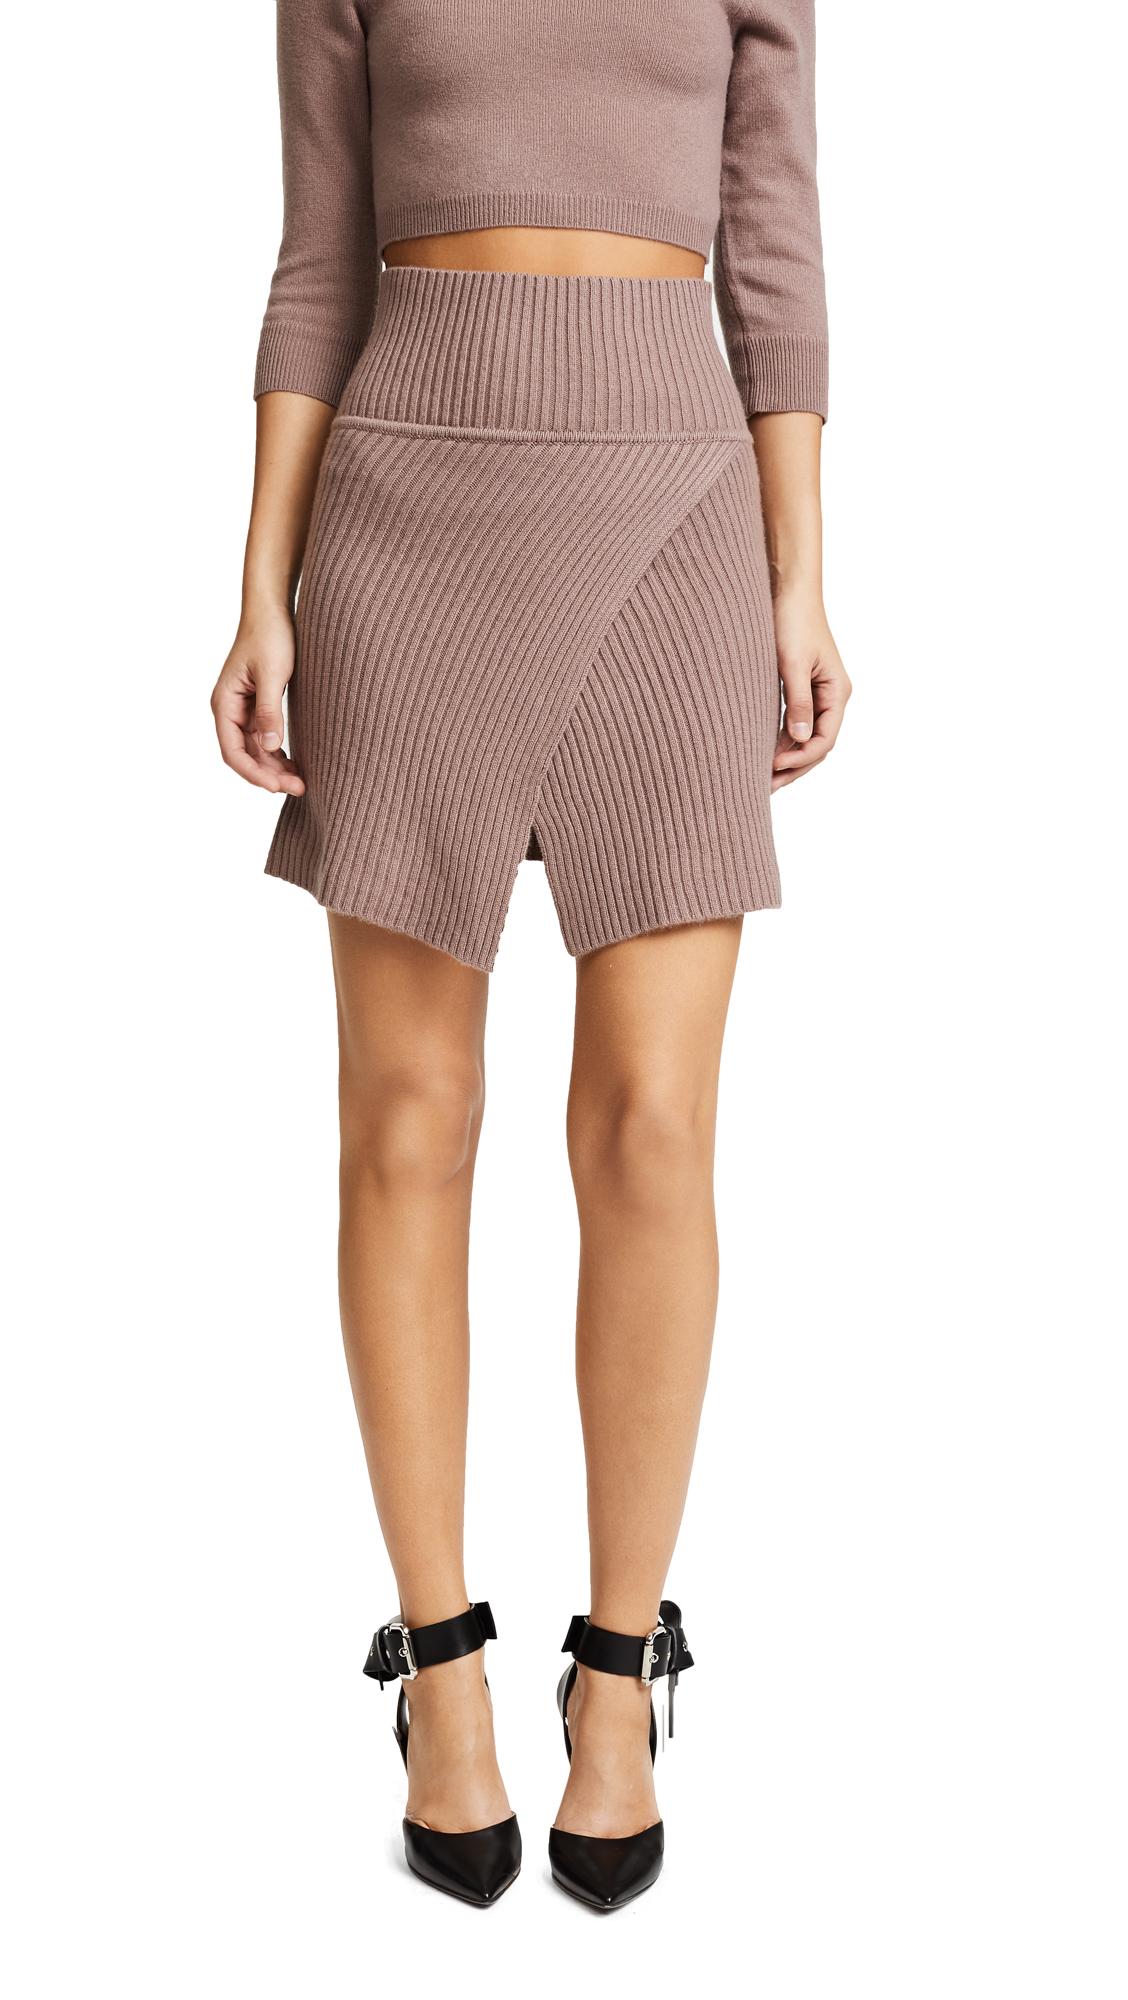 ThePerfext Cross Front Miniskirt - Rose